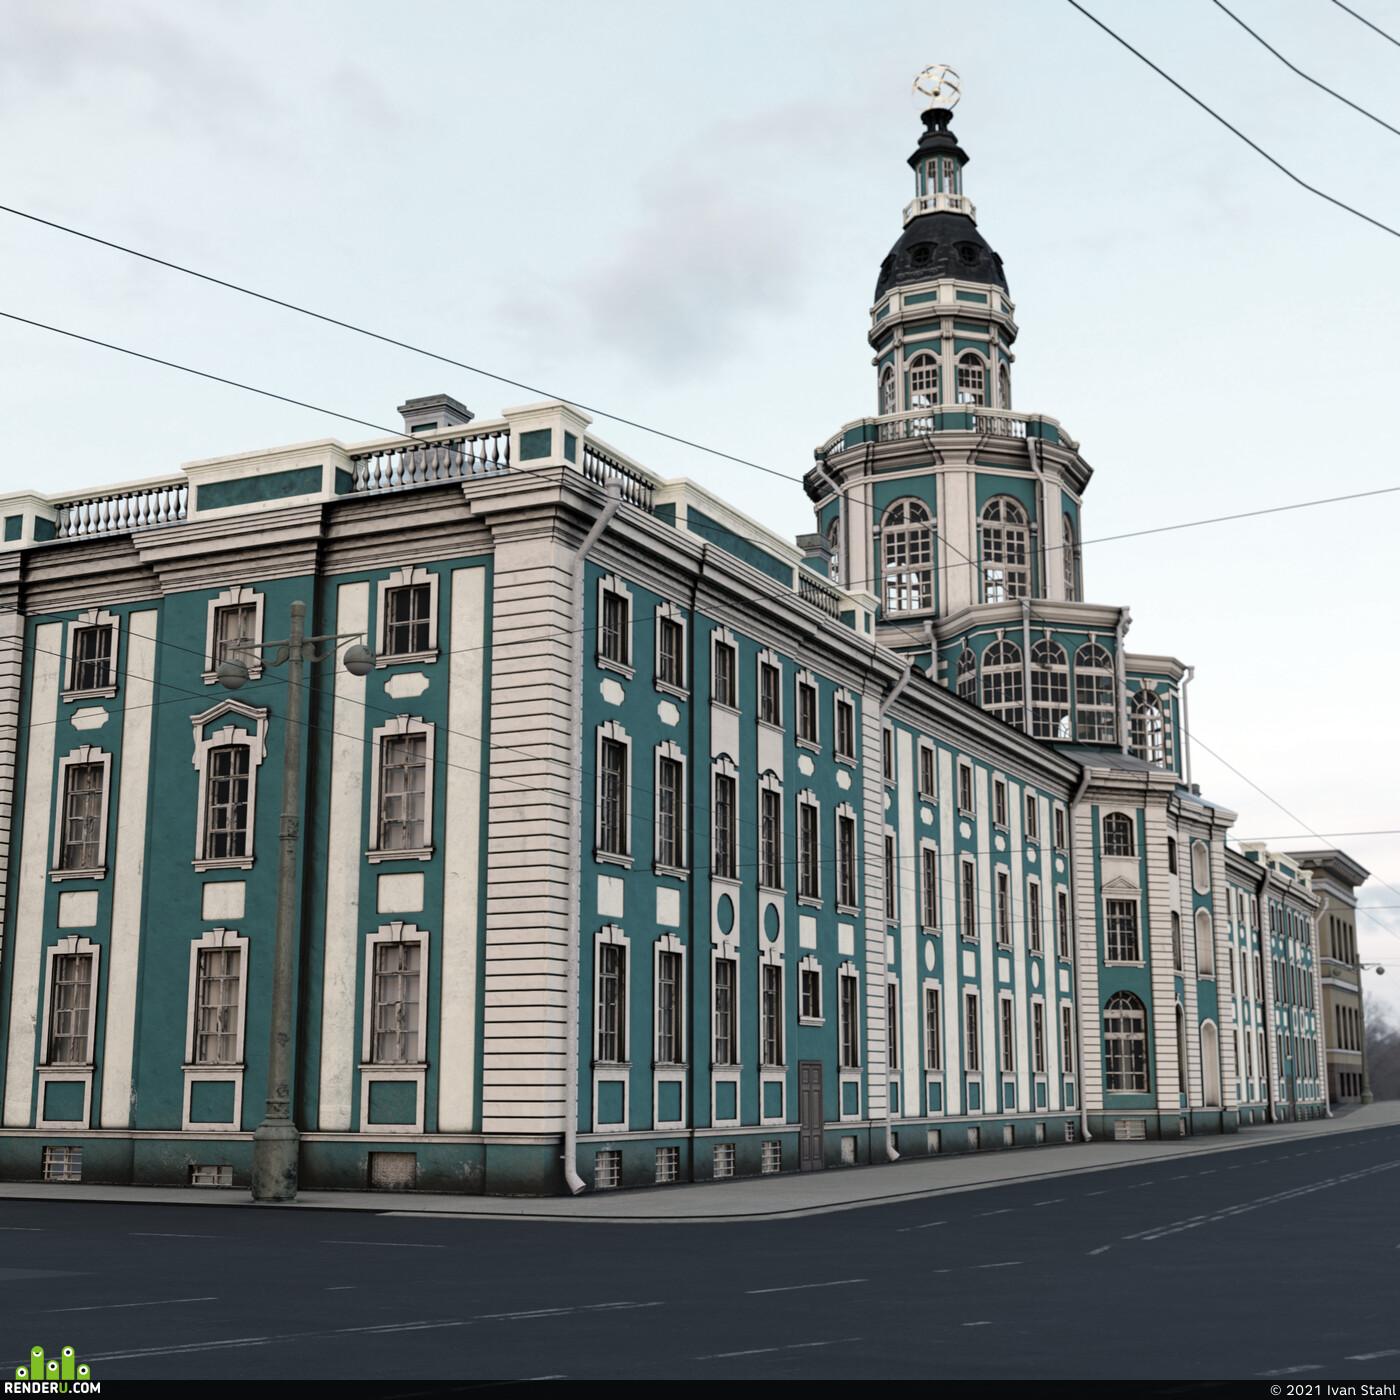 digital3d, architecturalvisualization, architectural, Concepts, environmentalconceptart&design, architecture, environment, blender, quixelmixer, concept